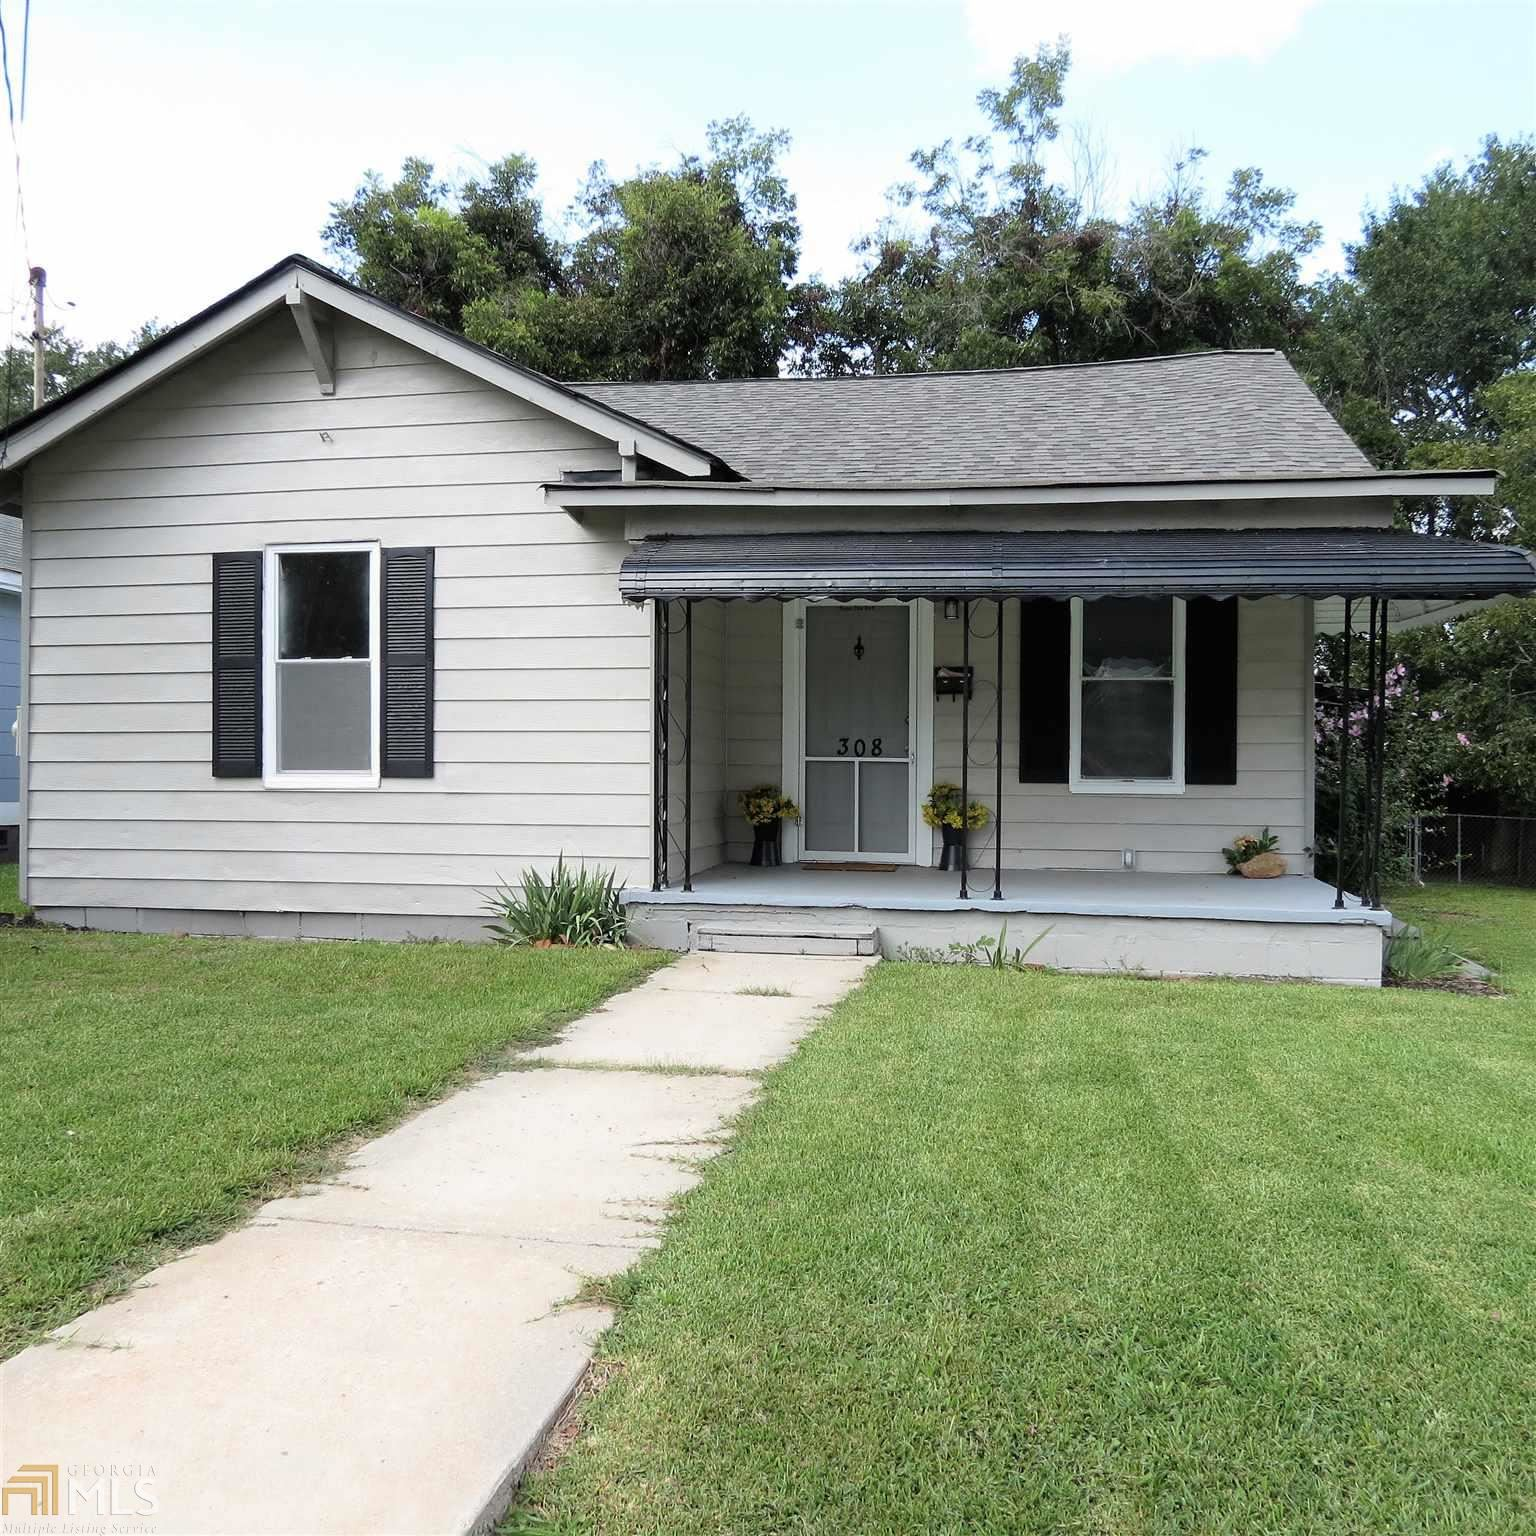 308 Carleeta, Barnesville, GA 30204 - MLS#: 8849938